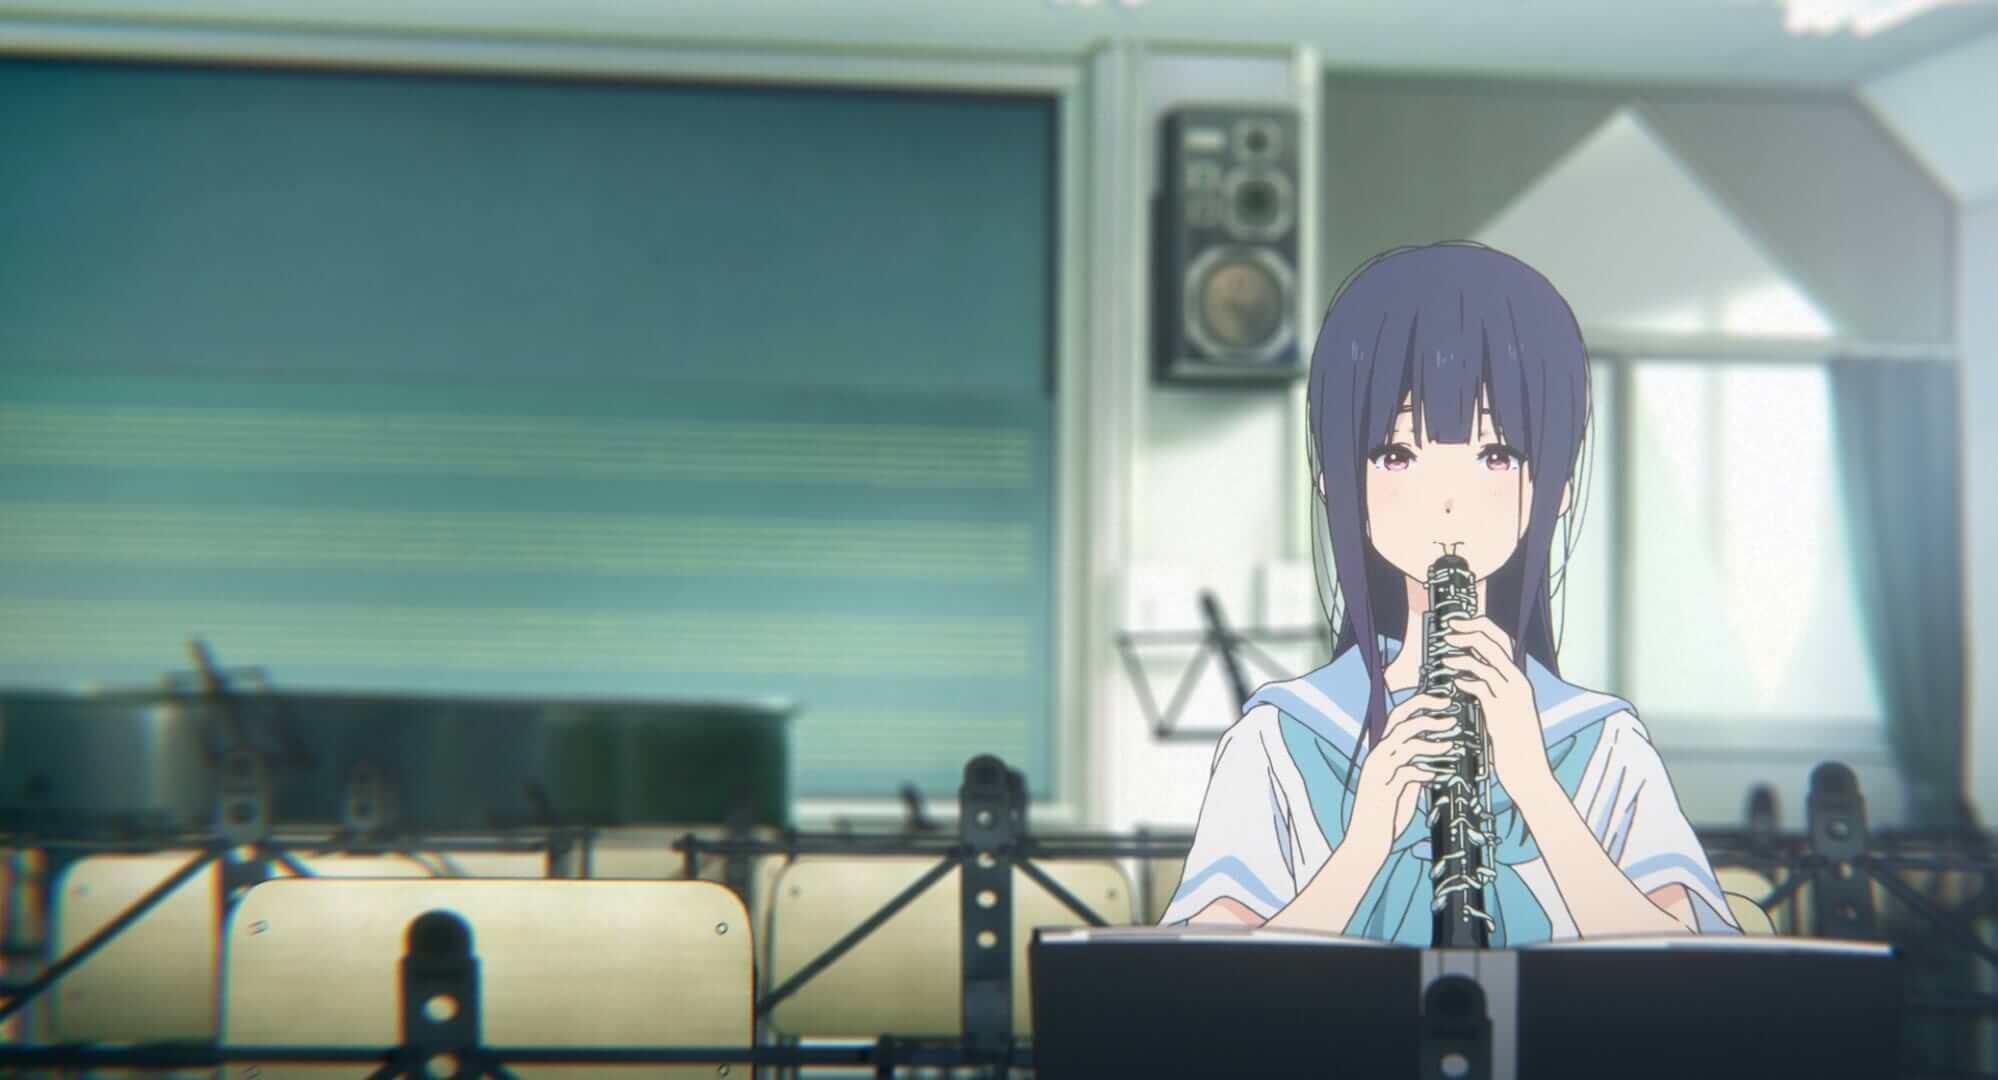 Mizore Yorizuka, performed by Atsumi Tanezaki, playing her signature oboe.